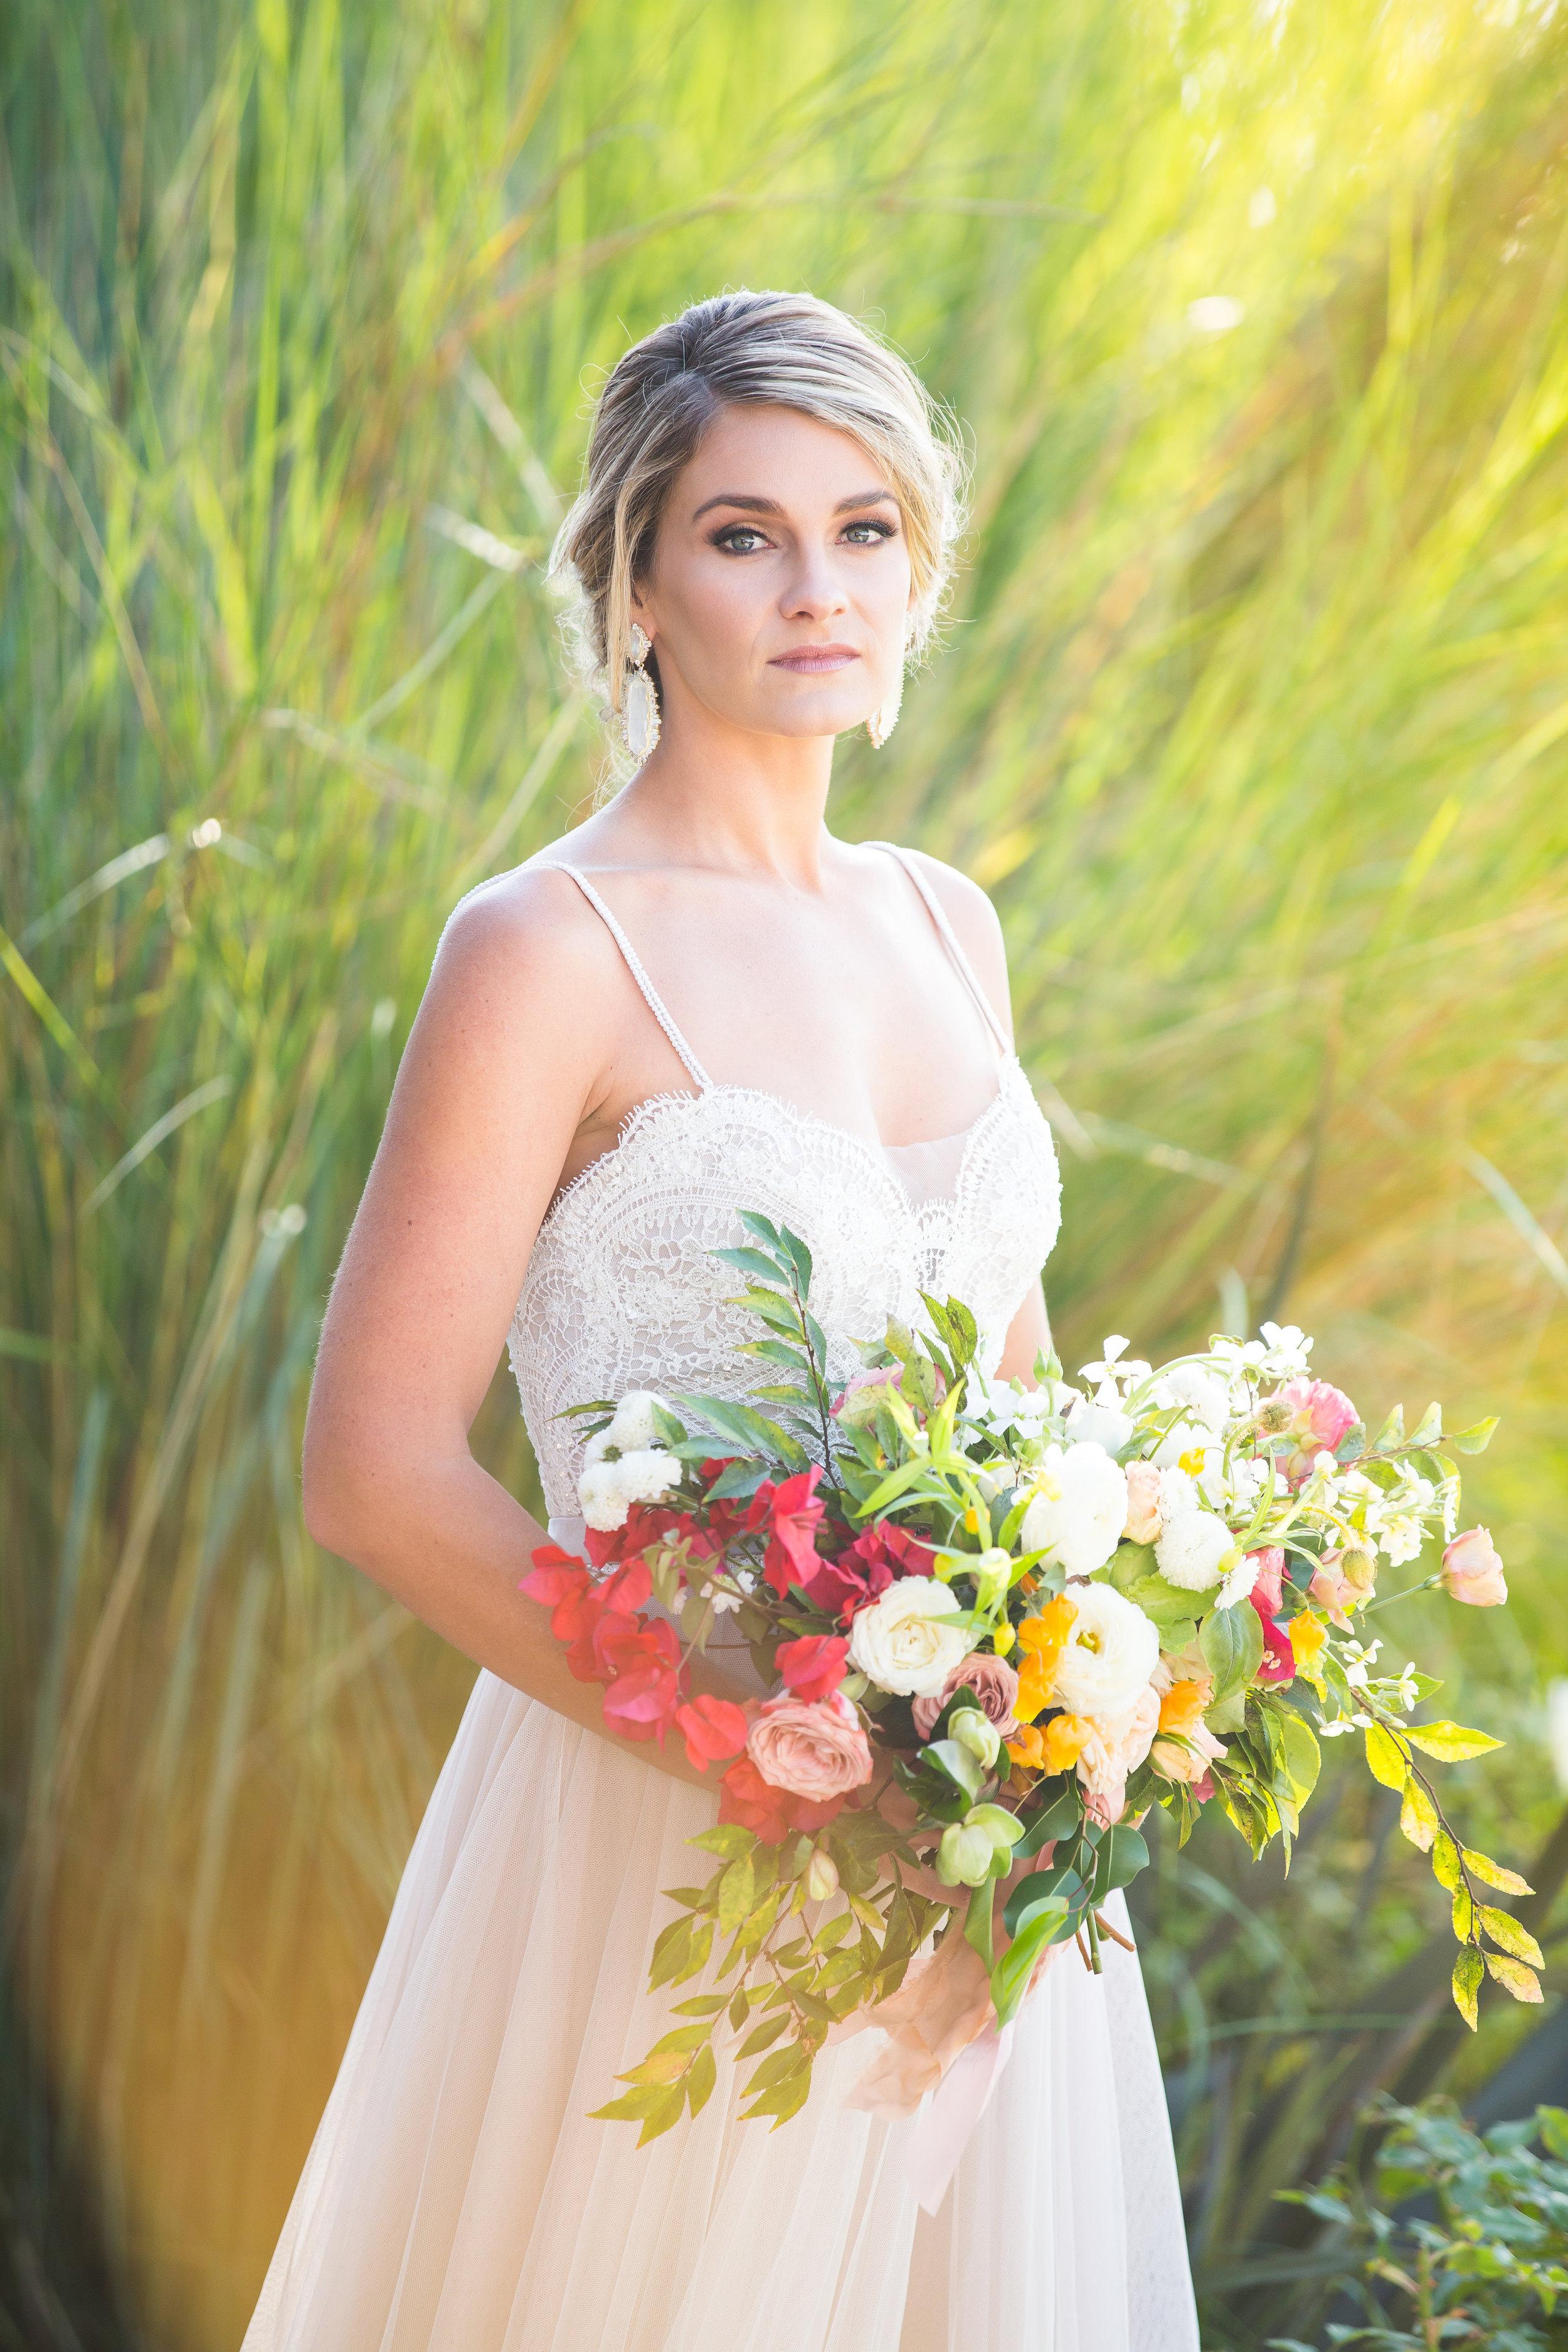 carsten_tice_orange_county_wedding_photographer-0624.jpg